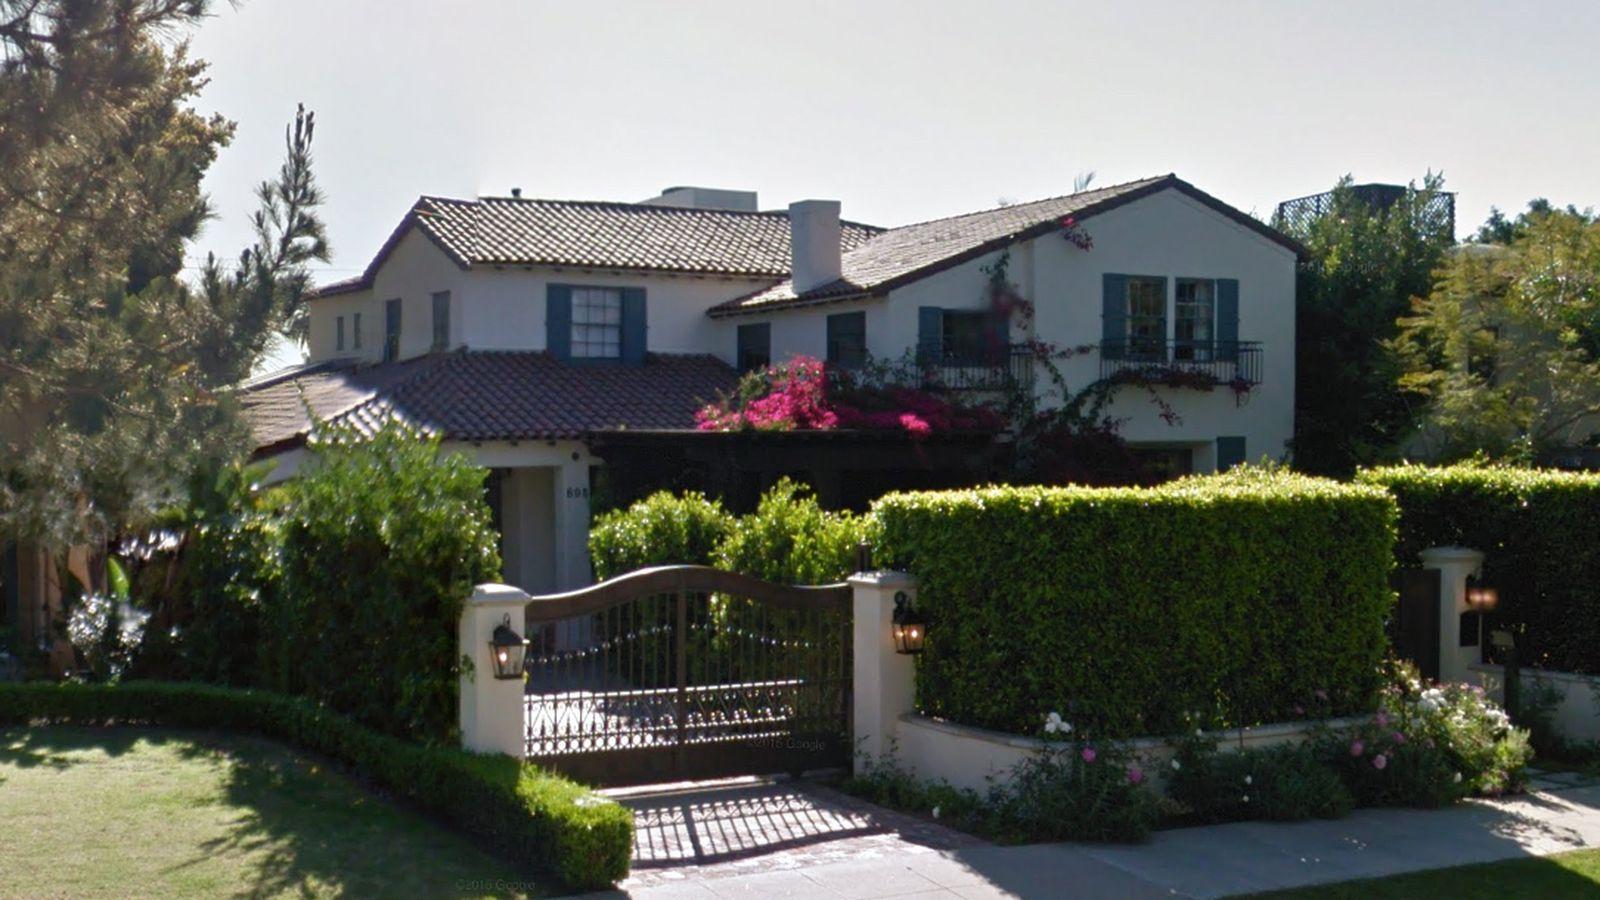 Fauxtalian Apartment Developer Geoff Palmer Sells Home In